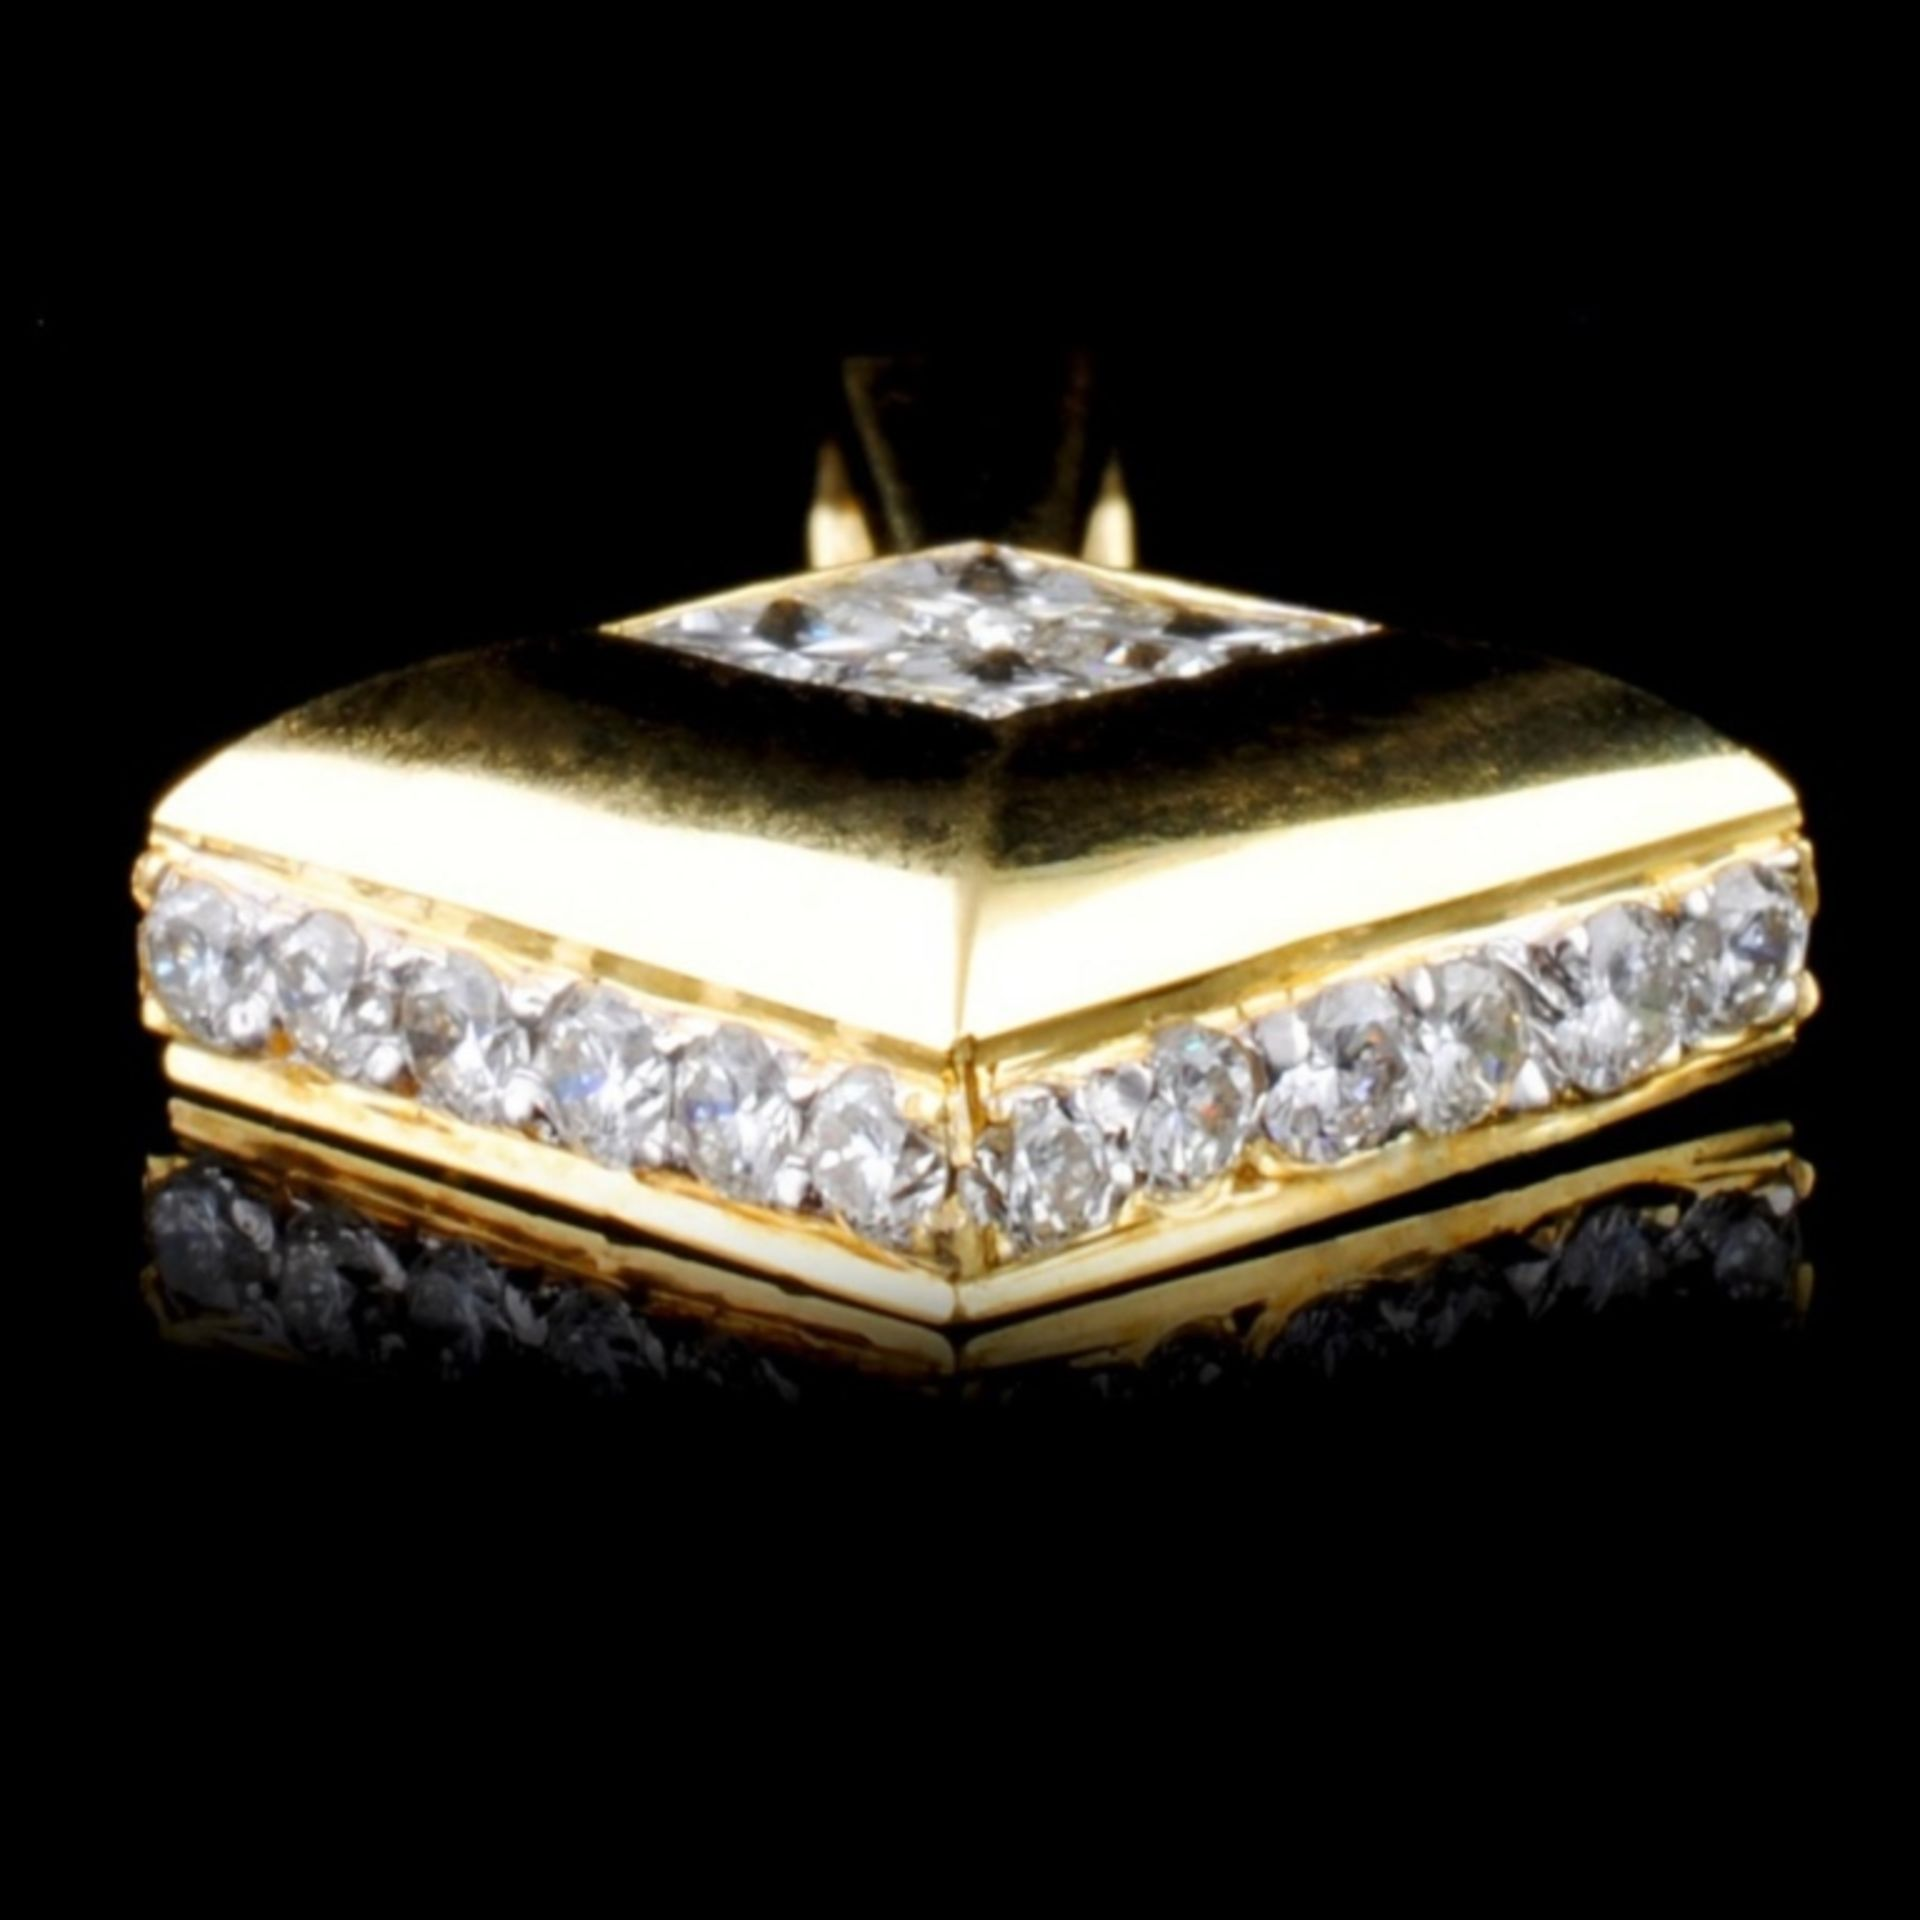 18K Yellow Gold 1.43ctw Diamond Pendant - Image 2 of 3